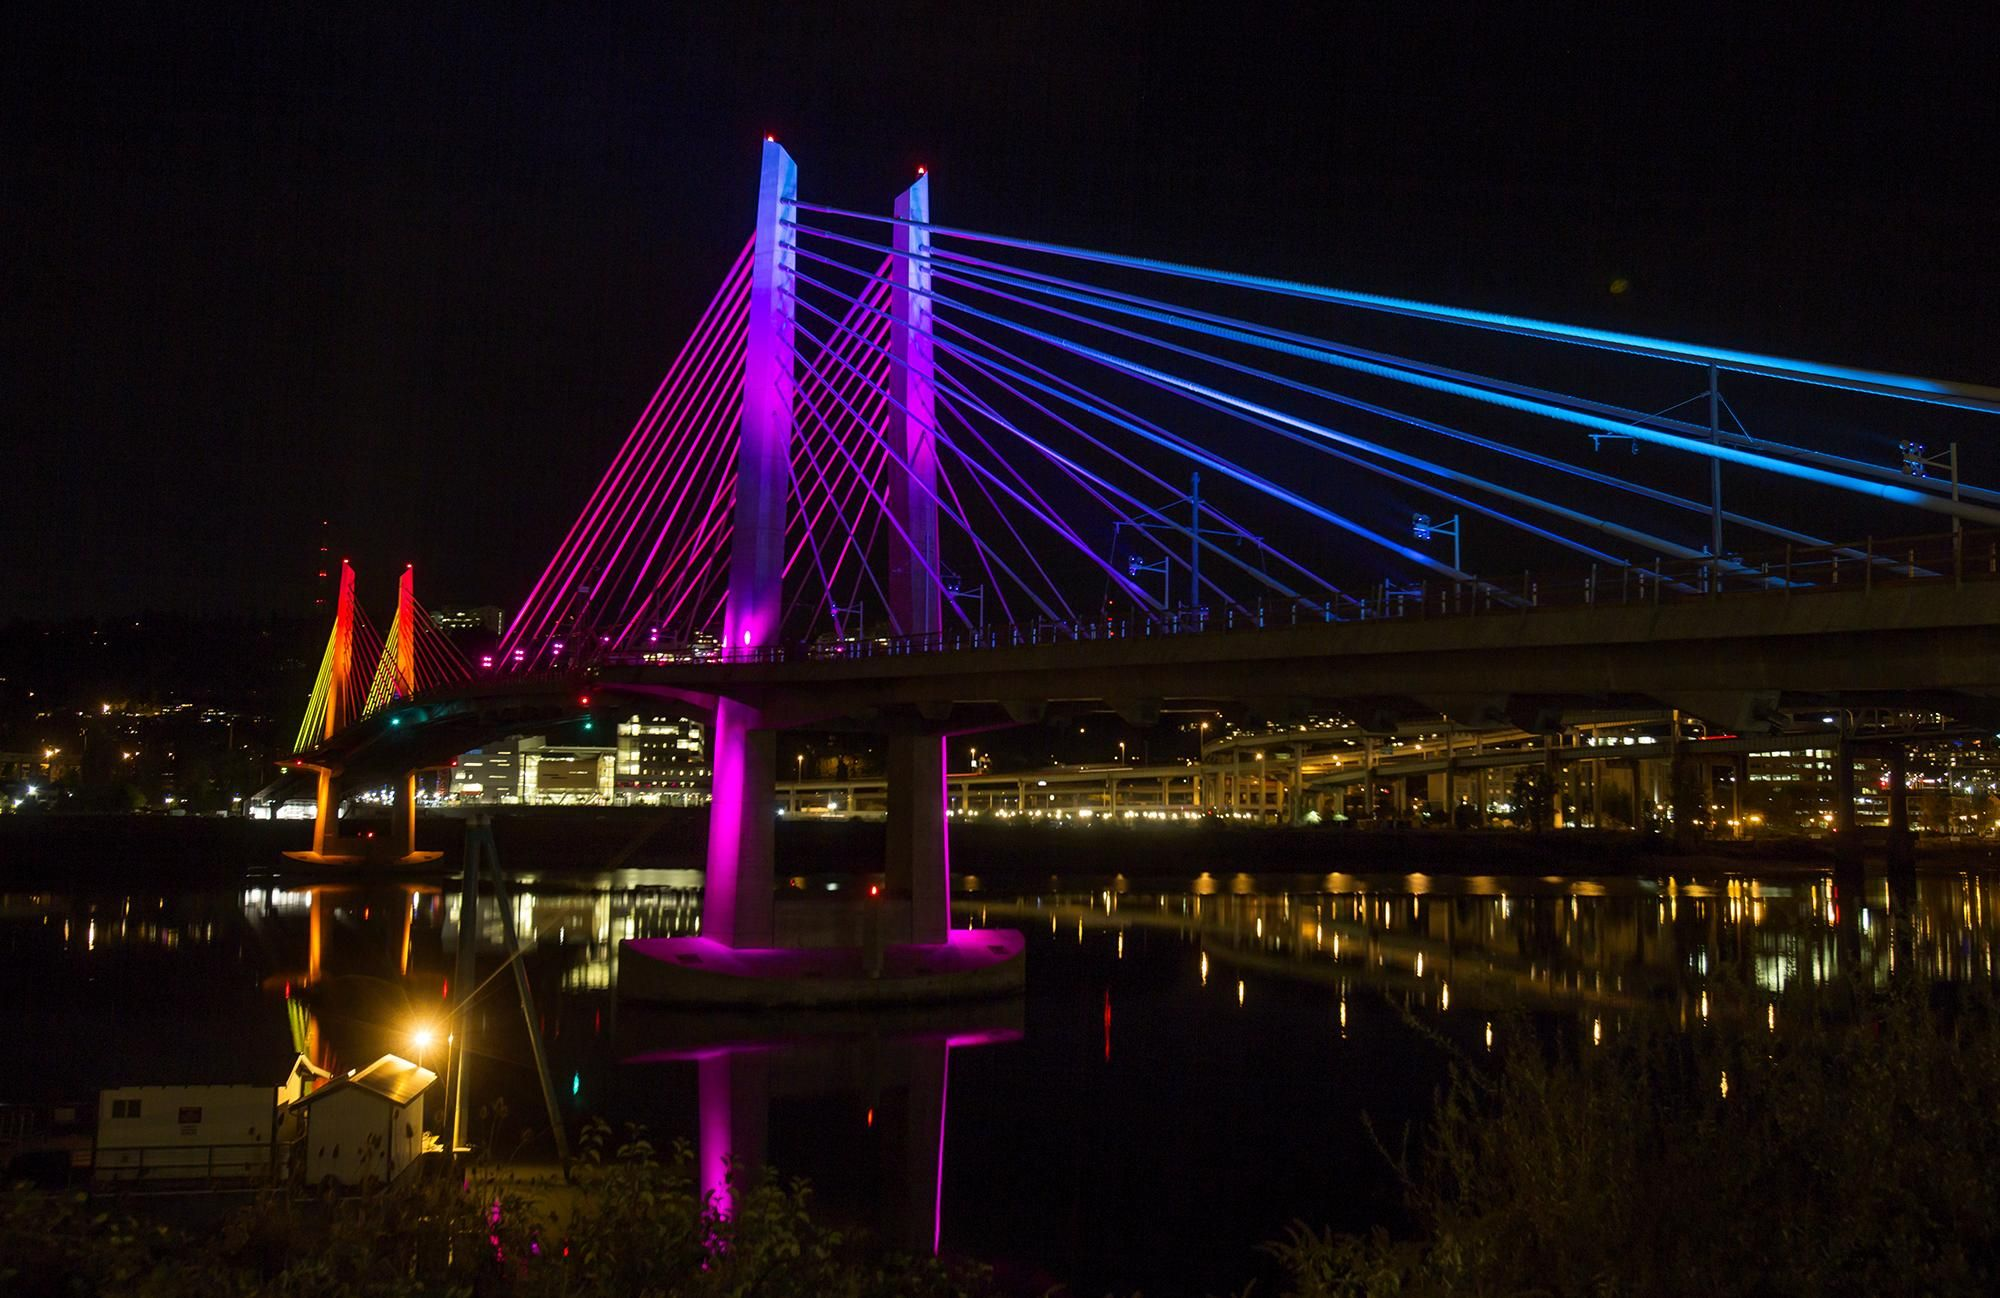 80s night at tilikum crossing | other | portland, stuff to do